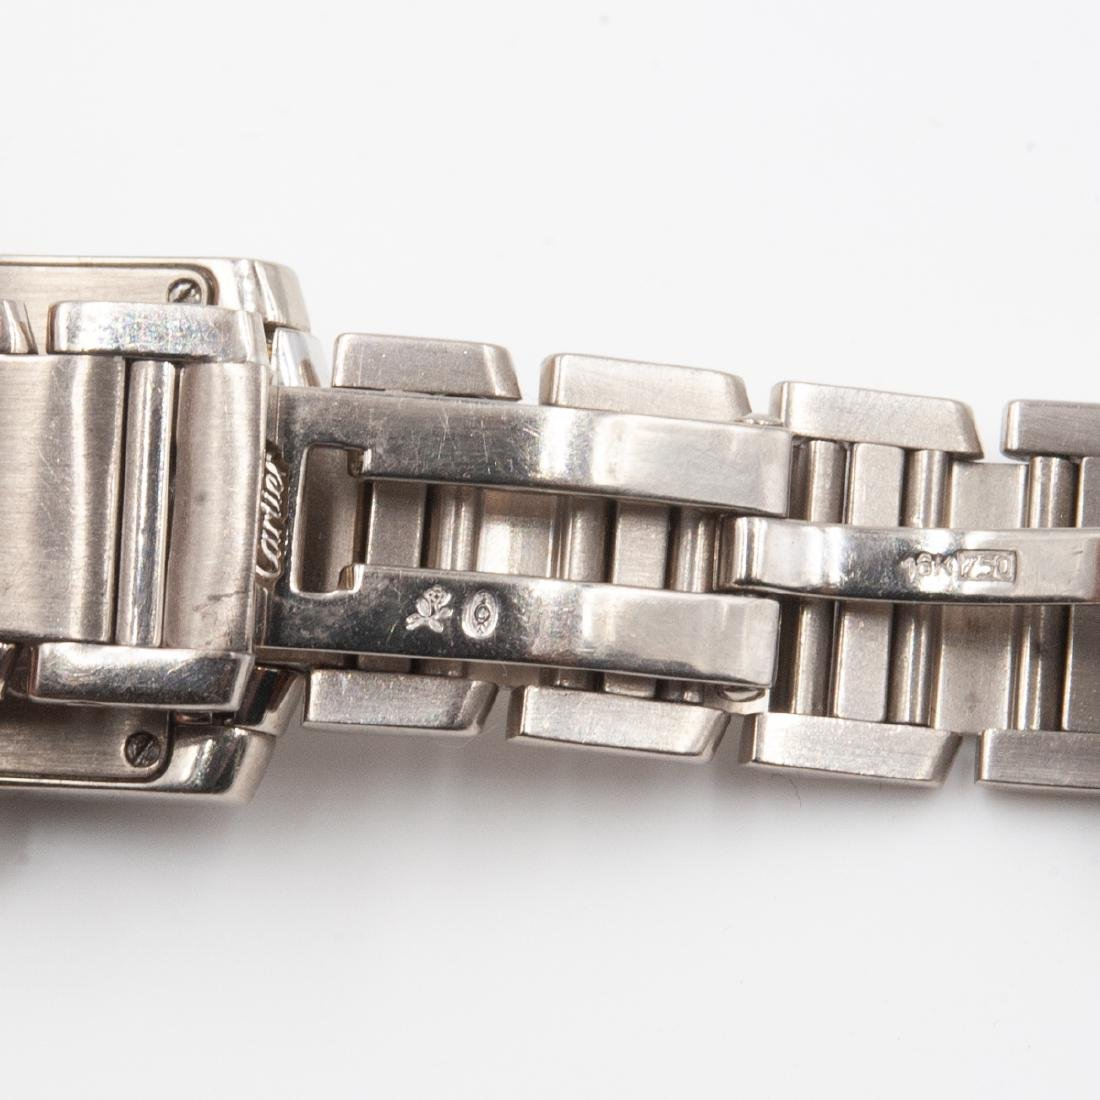 18k Gold Cartier Ladies Watch - 4